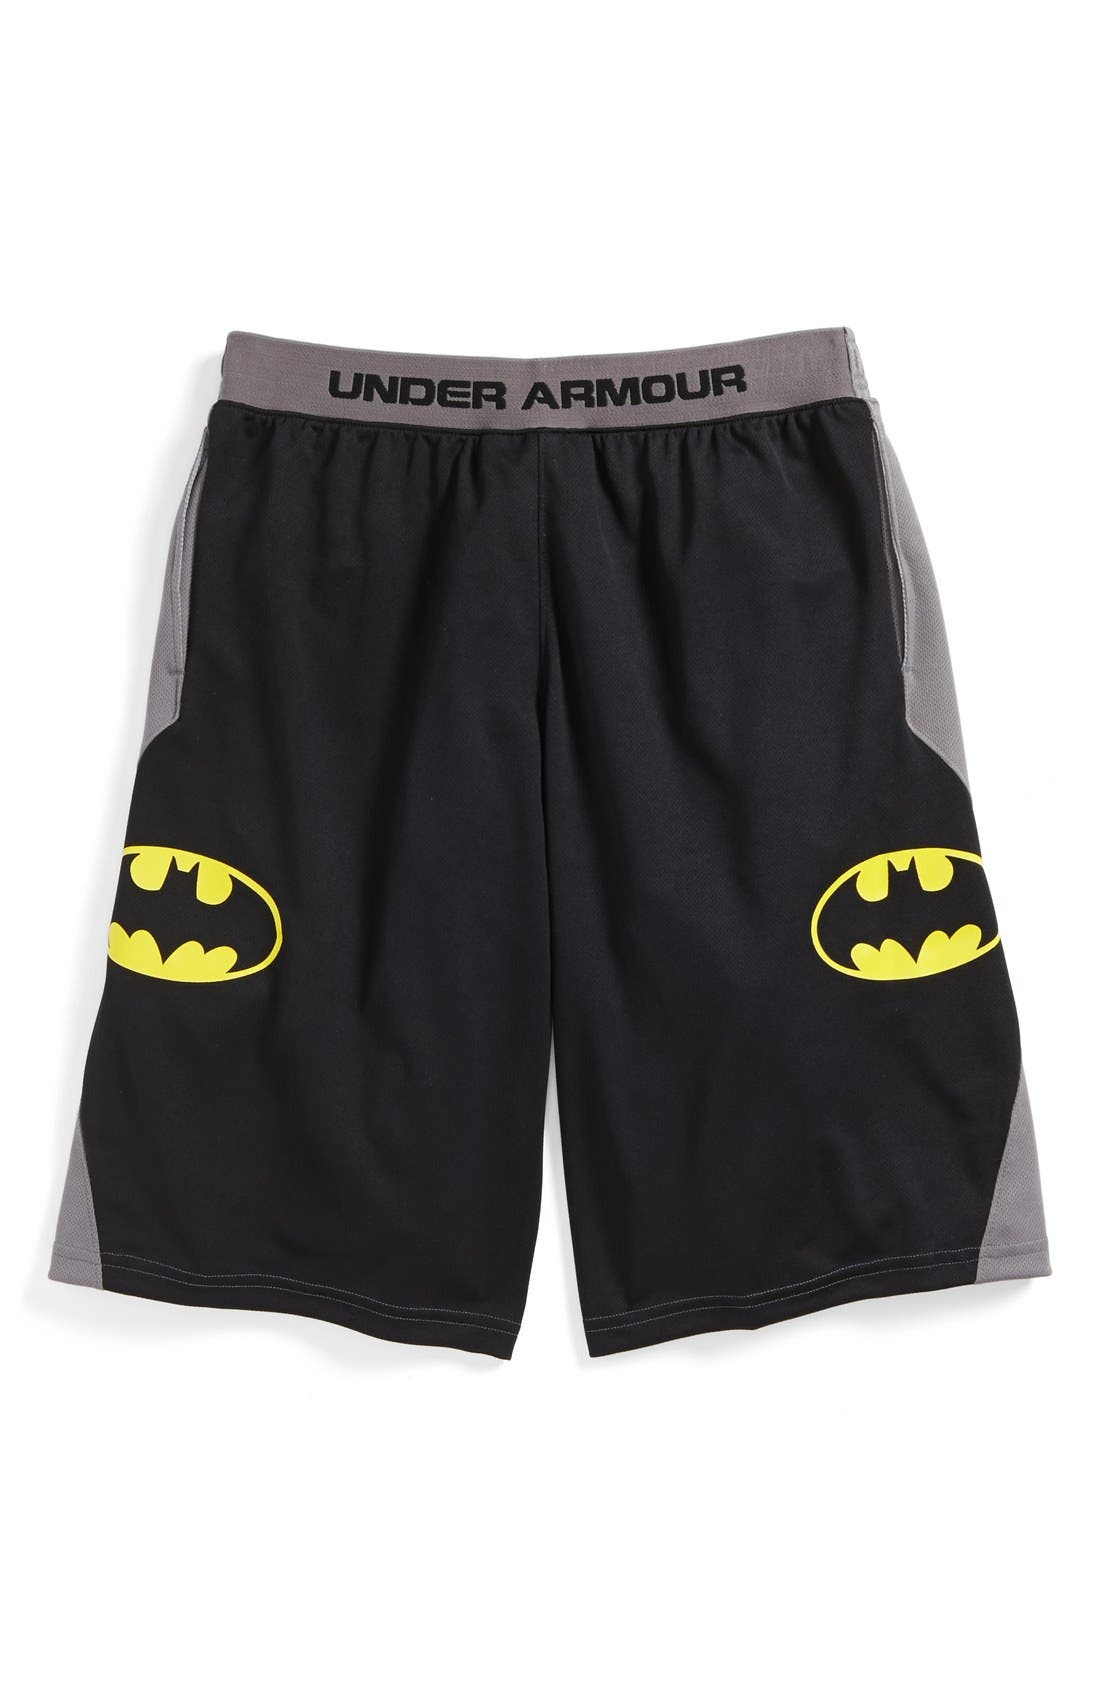 Alternate Image 1 Selected - Under Armour 'Alter Ego - Batman' Shorts (Little Boys & Big Boys)